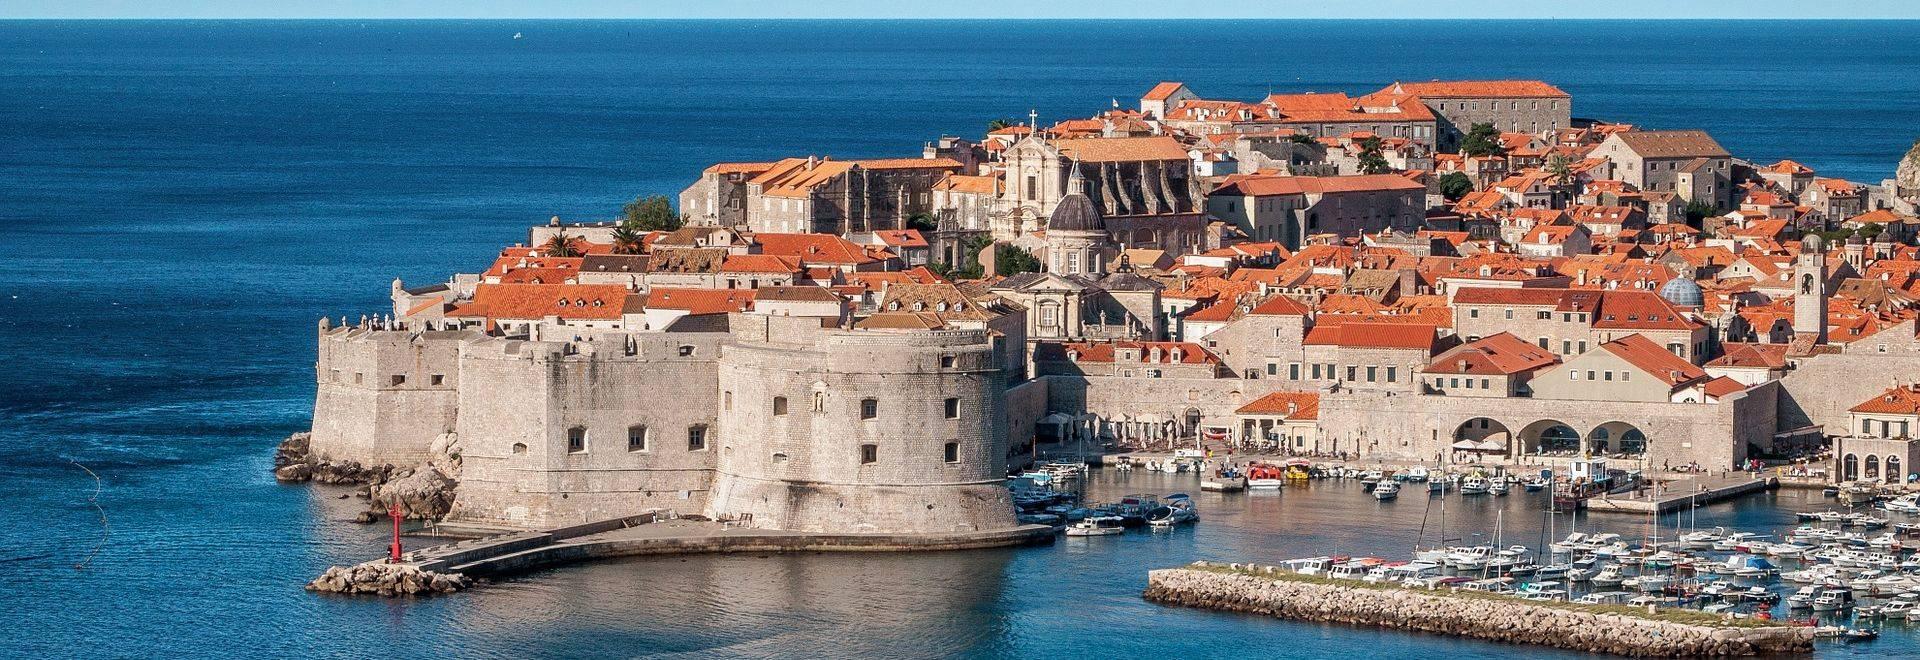 Croatia Dubrovnik